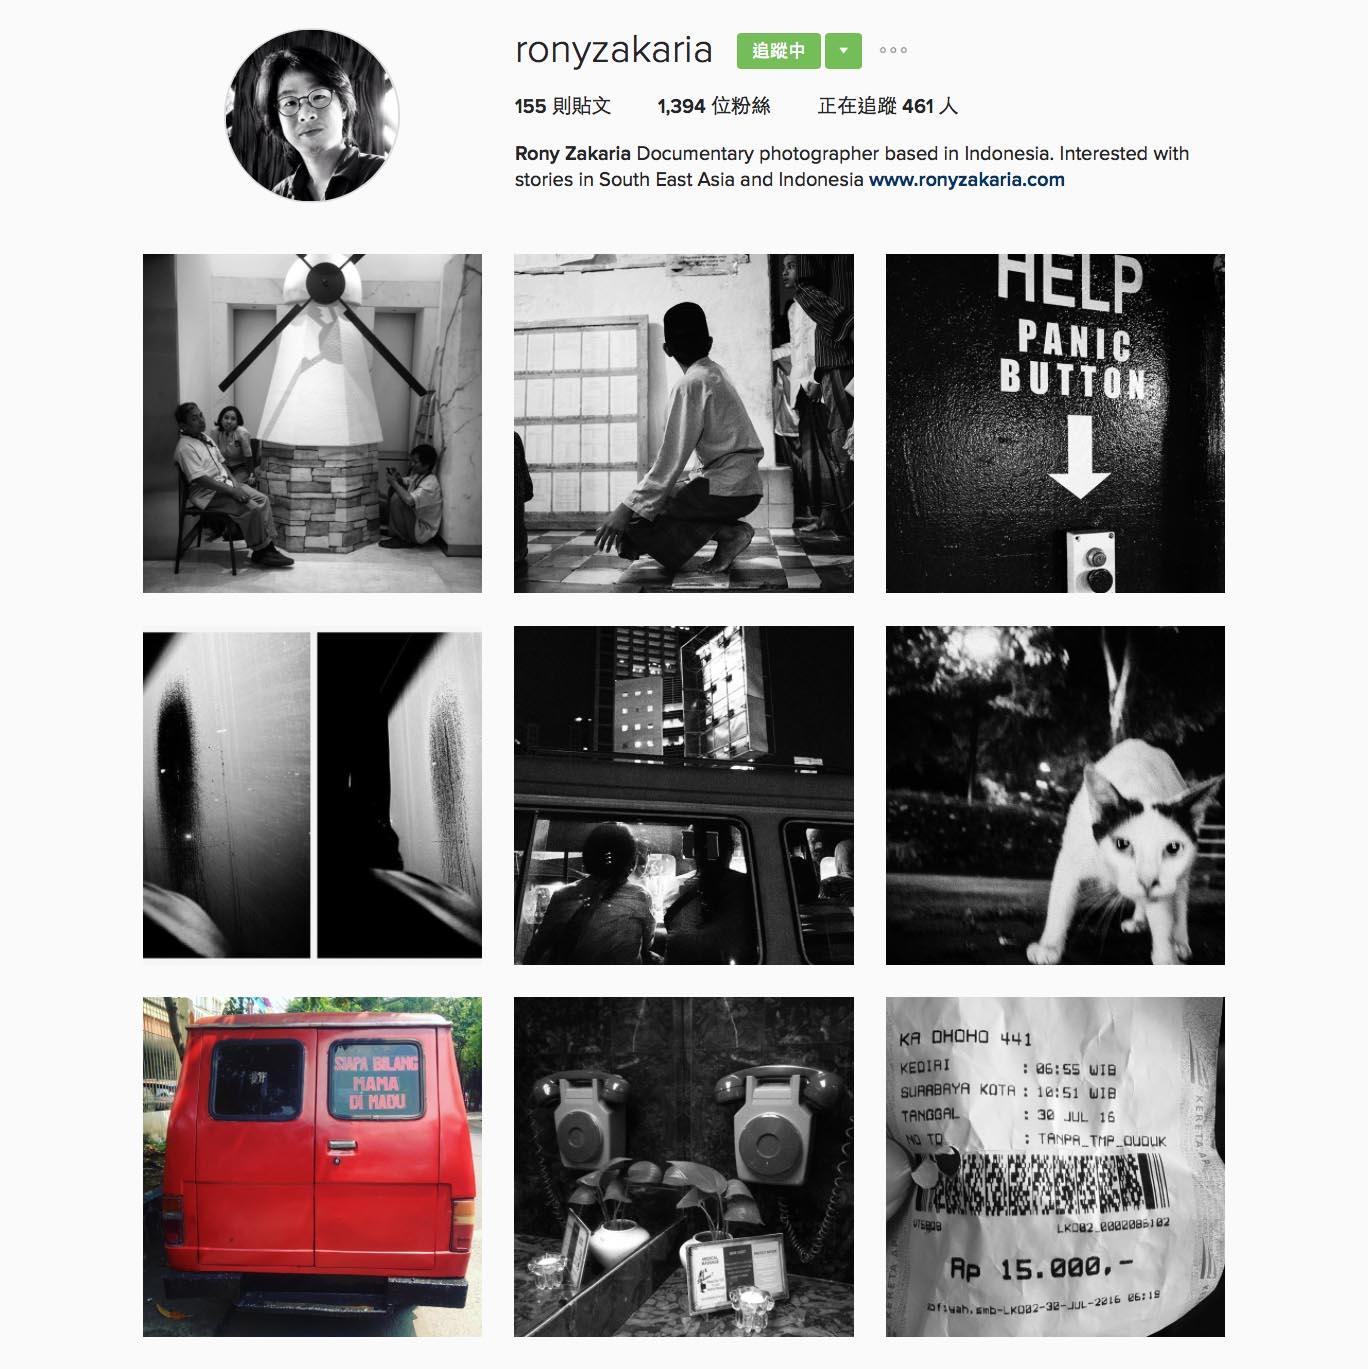 Rony Zakaria(@ronyzakaria),印尼攝影師,曾在菲律賓亞洲新聞中心學習,並曾獲得NPPA 最佳新聞攝影獎。